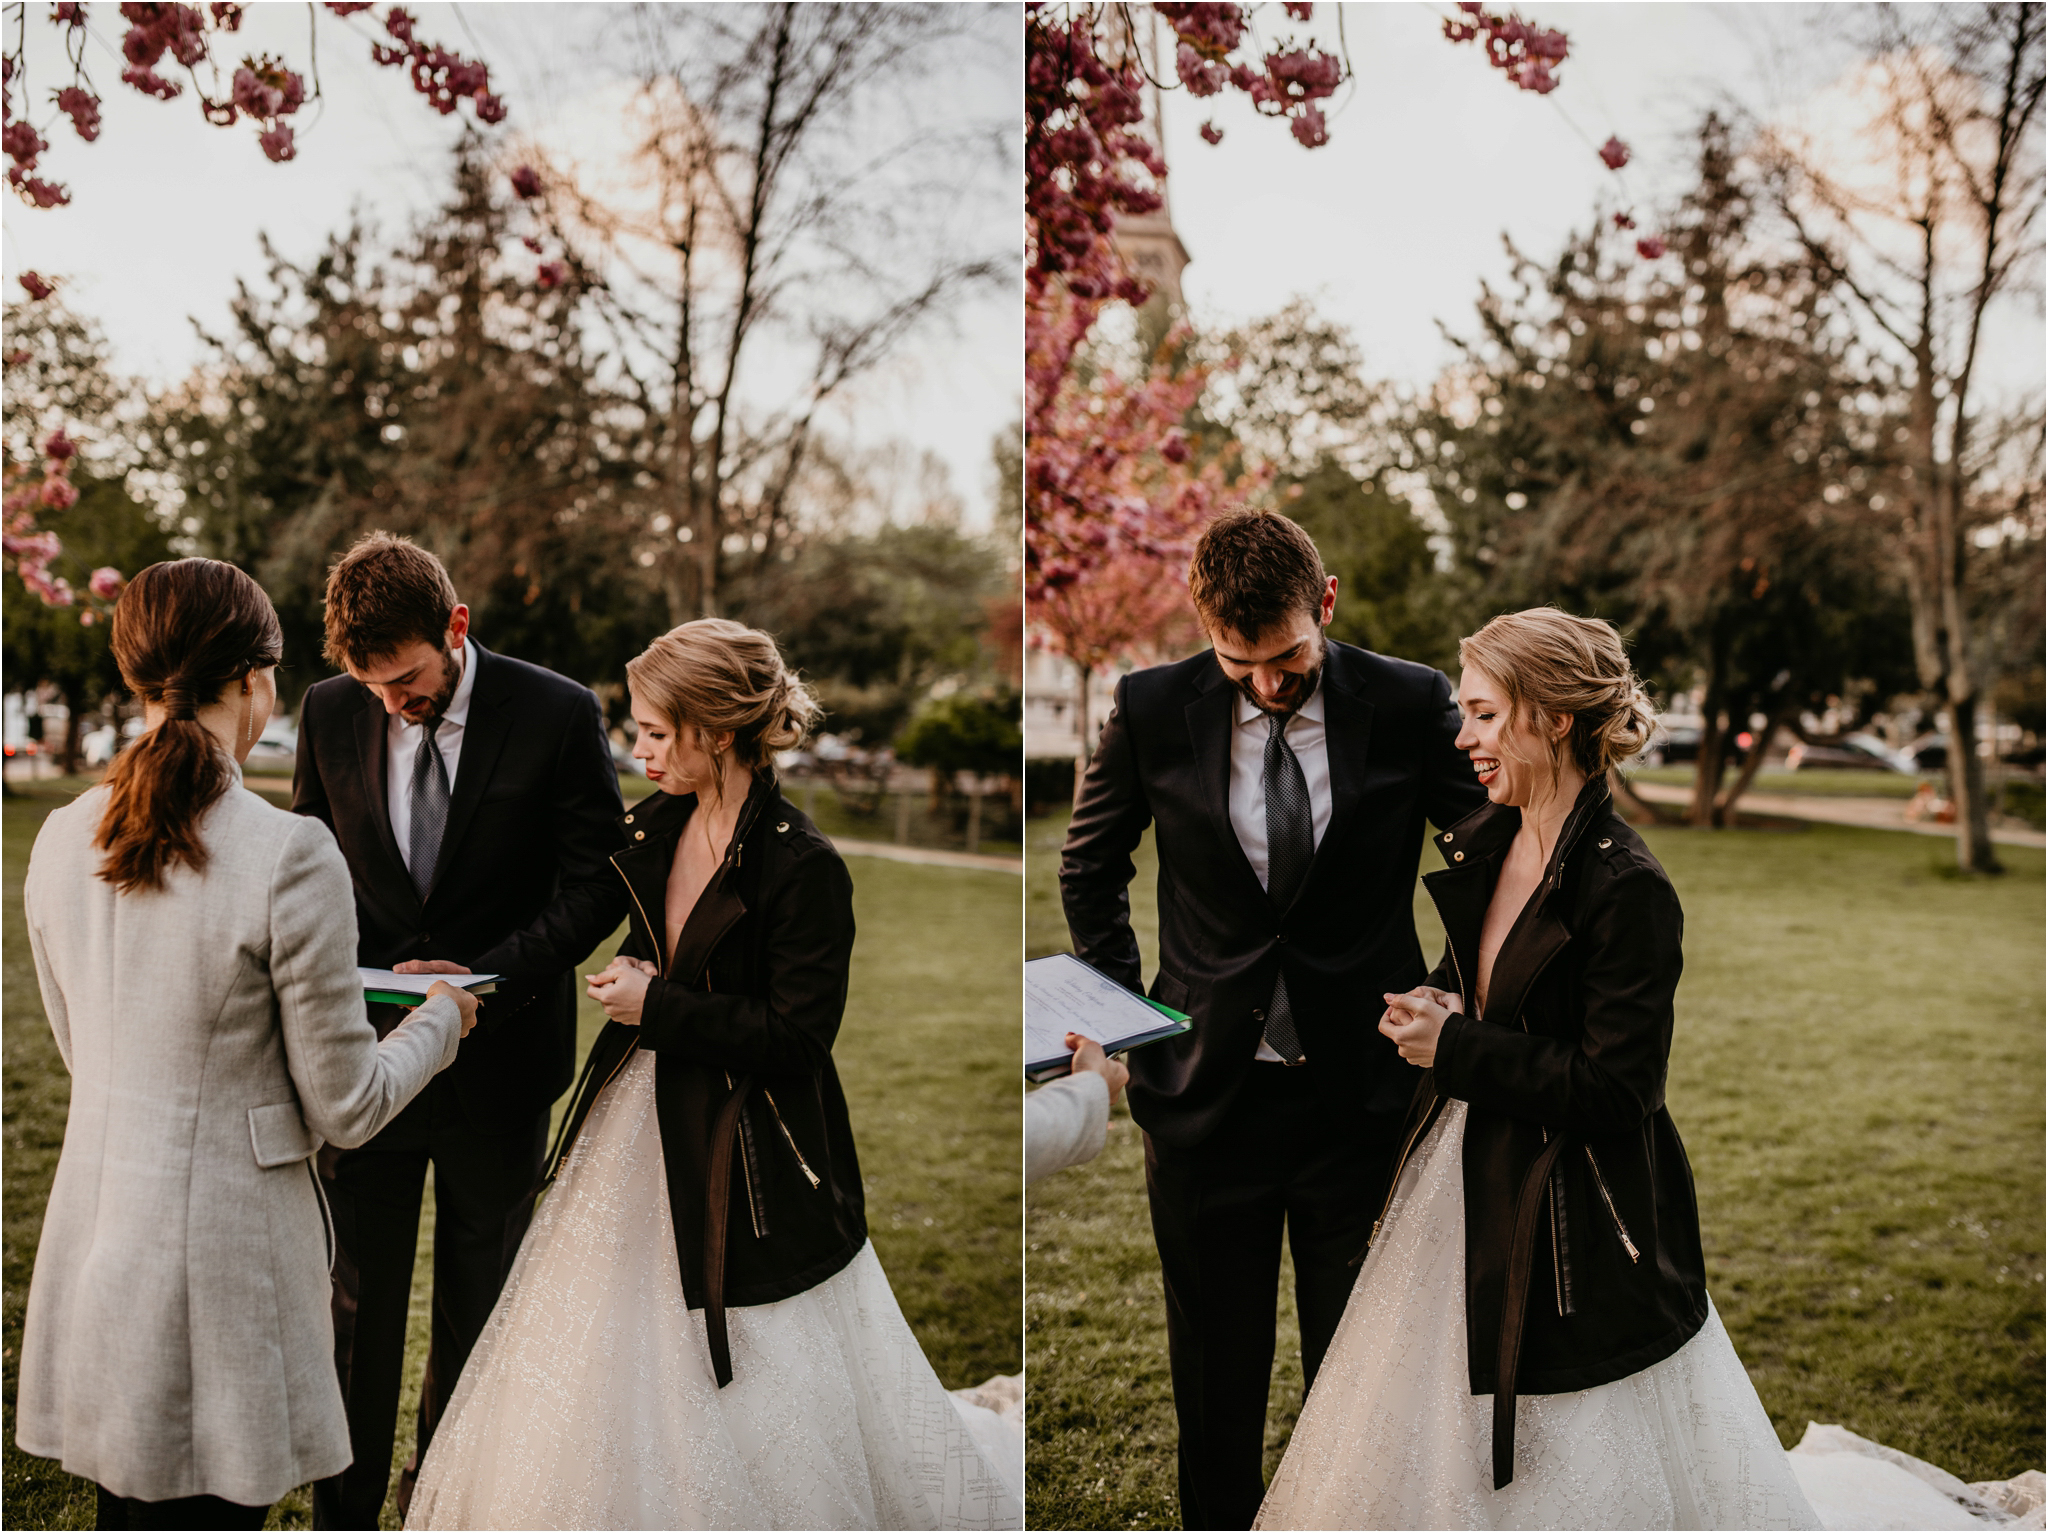 miranda-and-jared-paris-elopement-destination-wedding-photographer-041.jpg